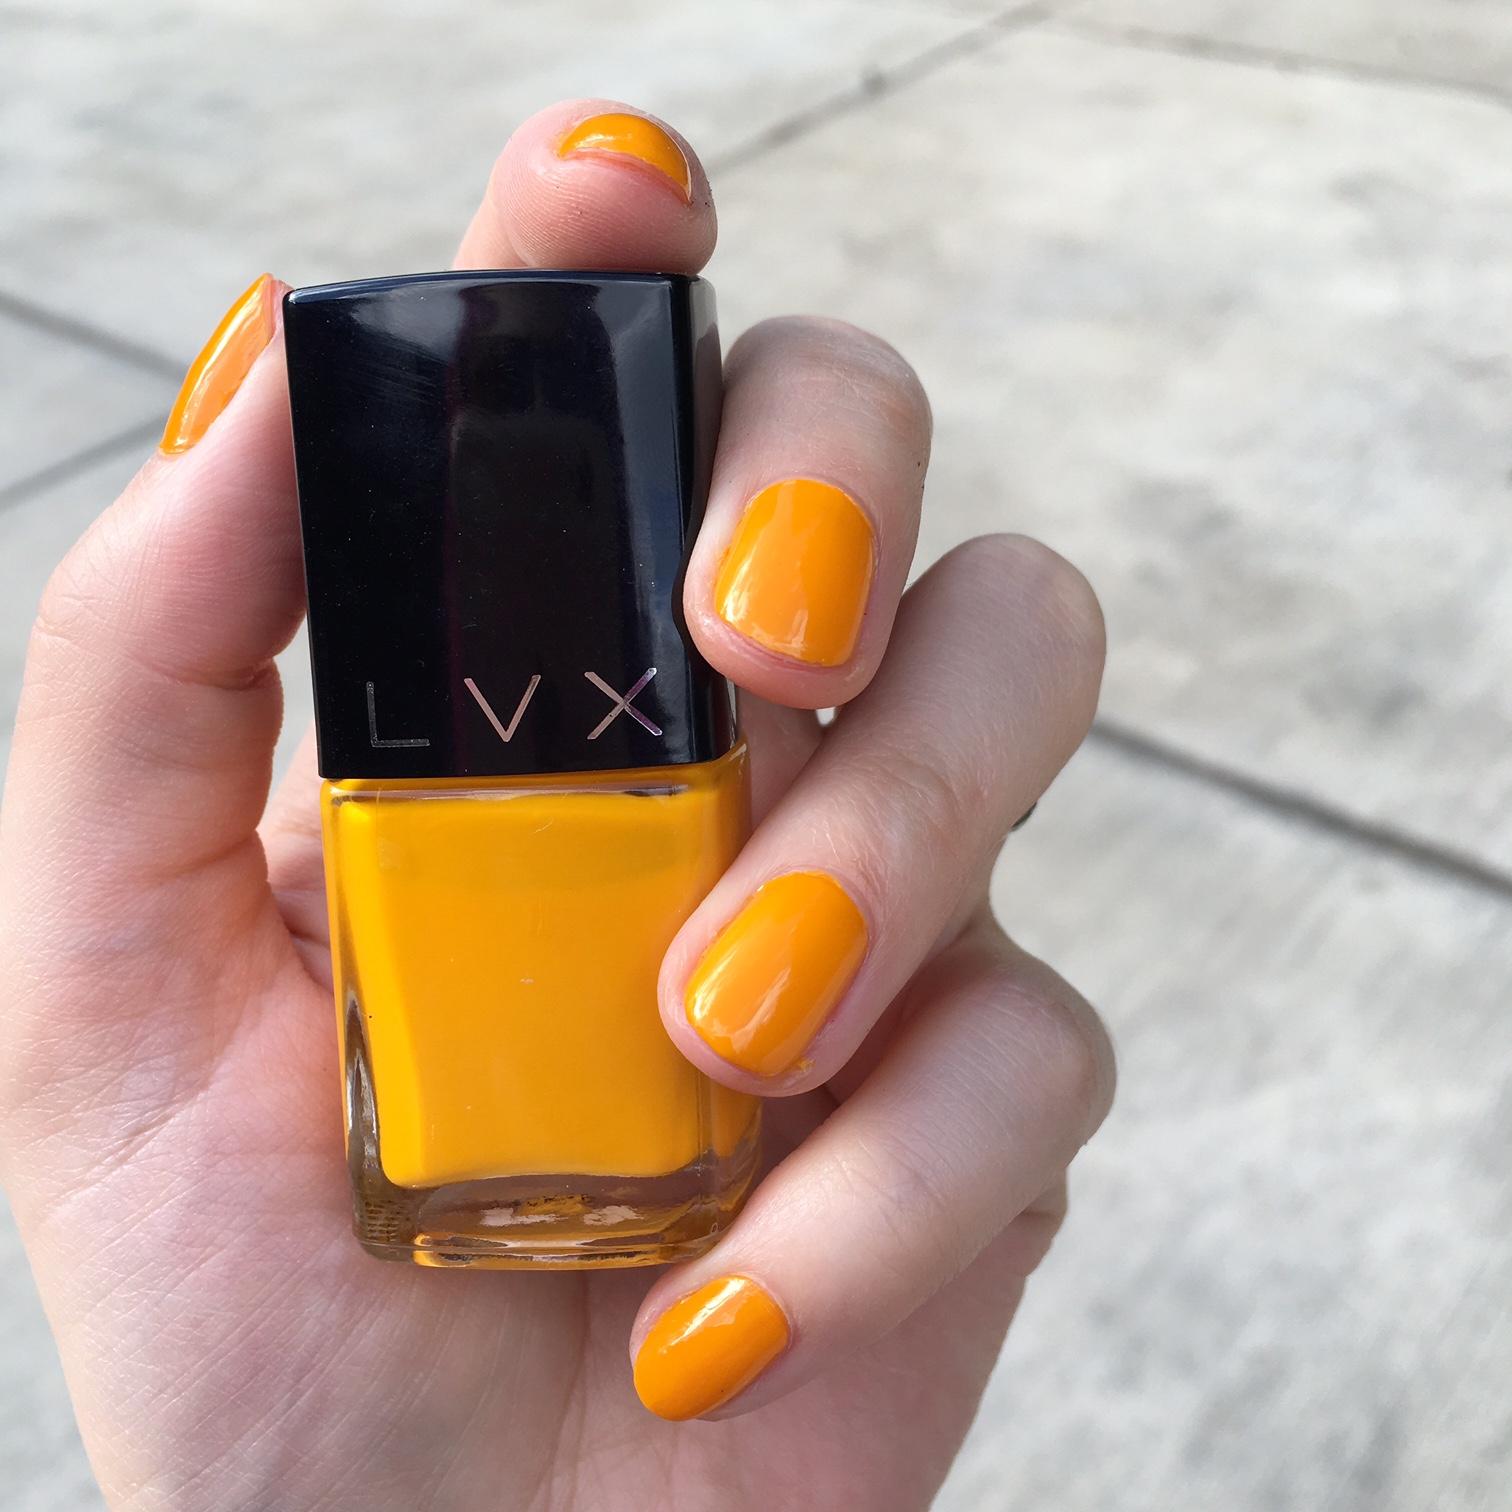 LVX Saffron vegan nail polish